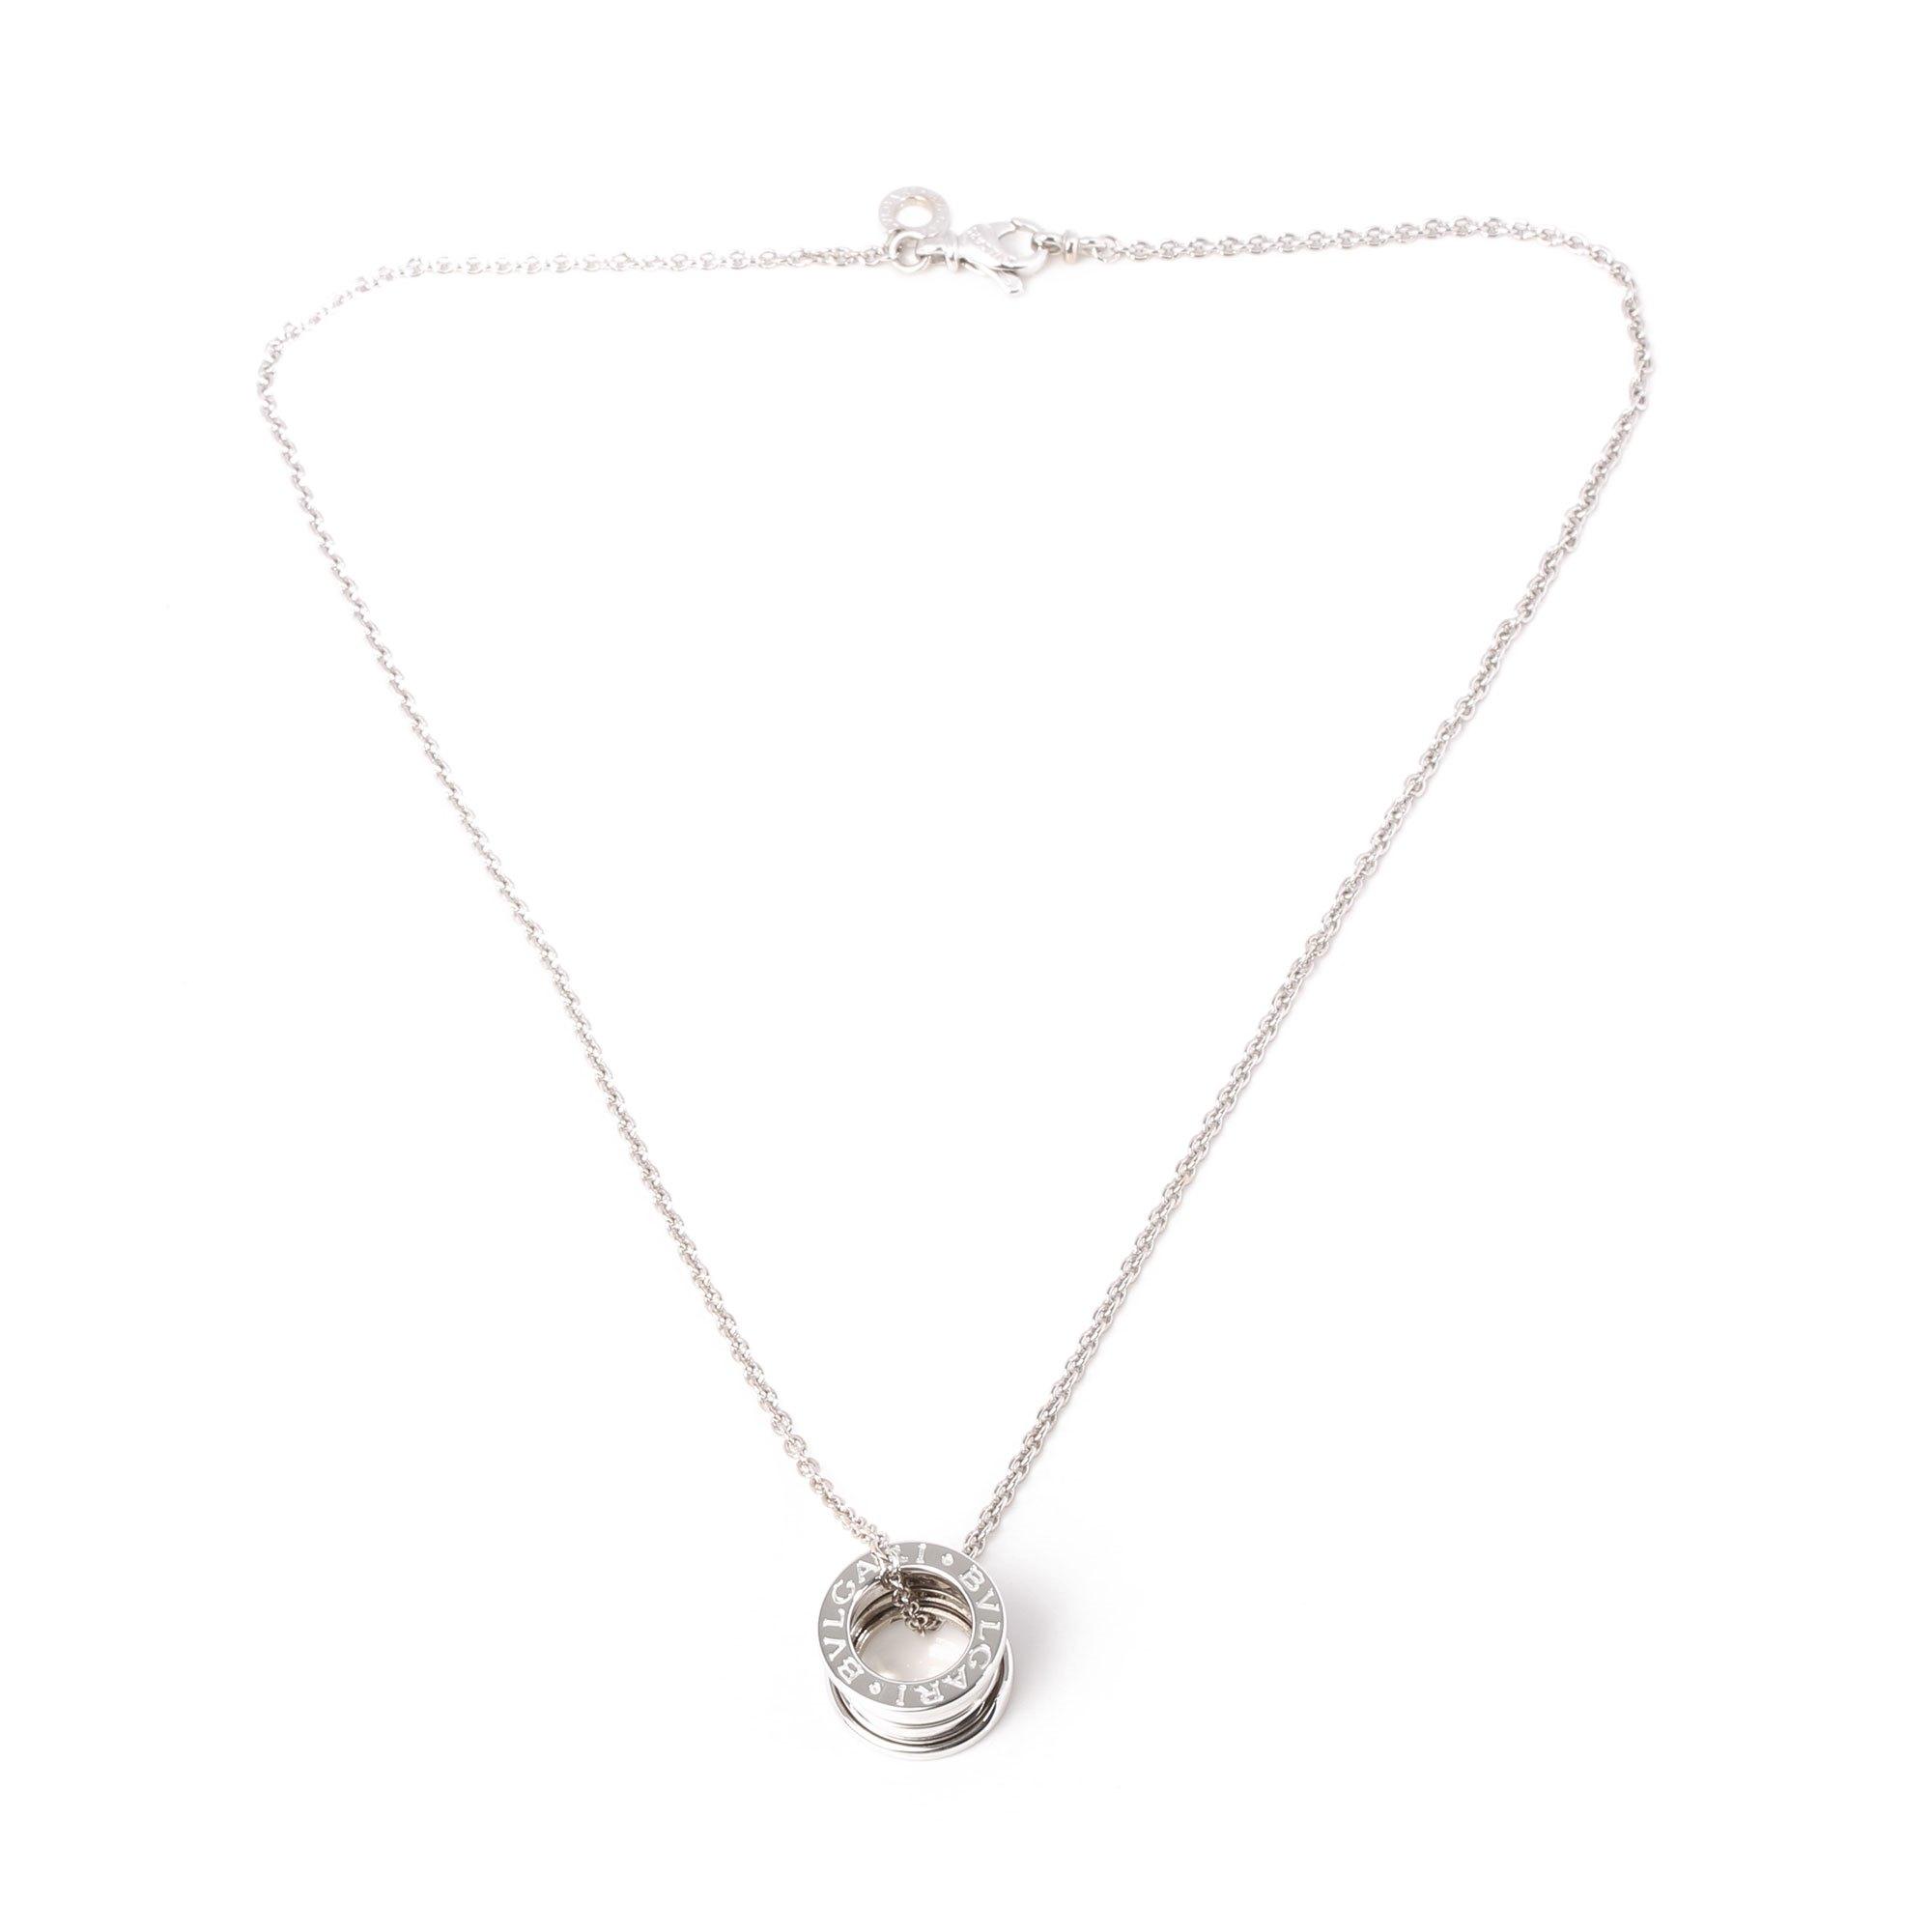 Bulgari B Zero 1 Pendant Necklace